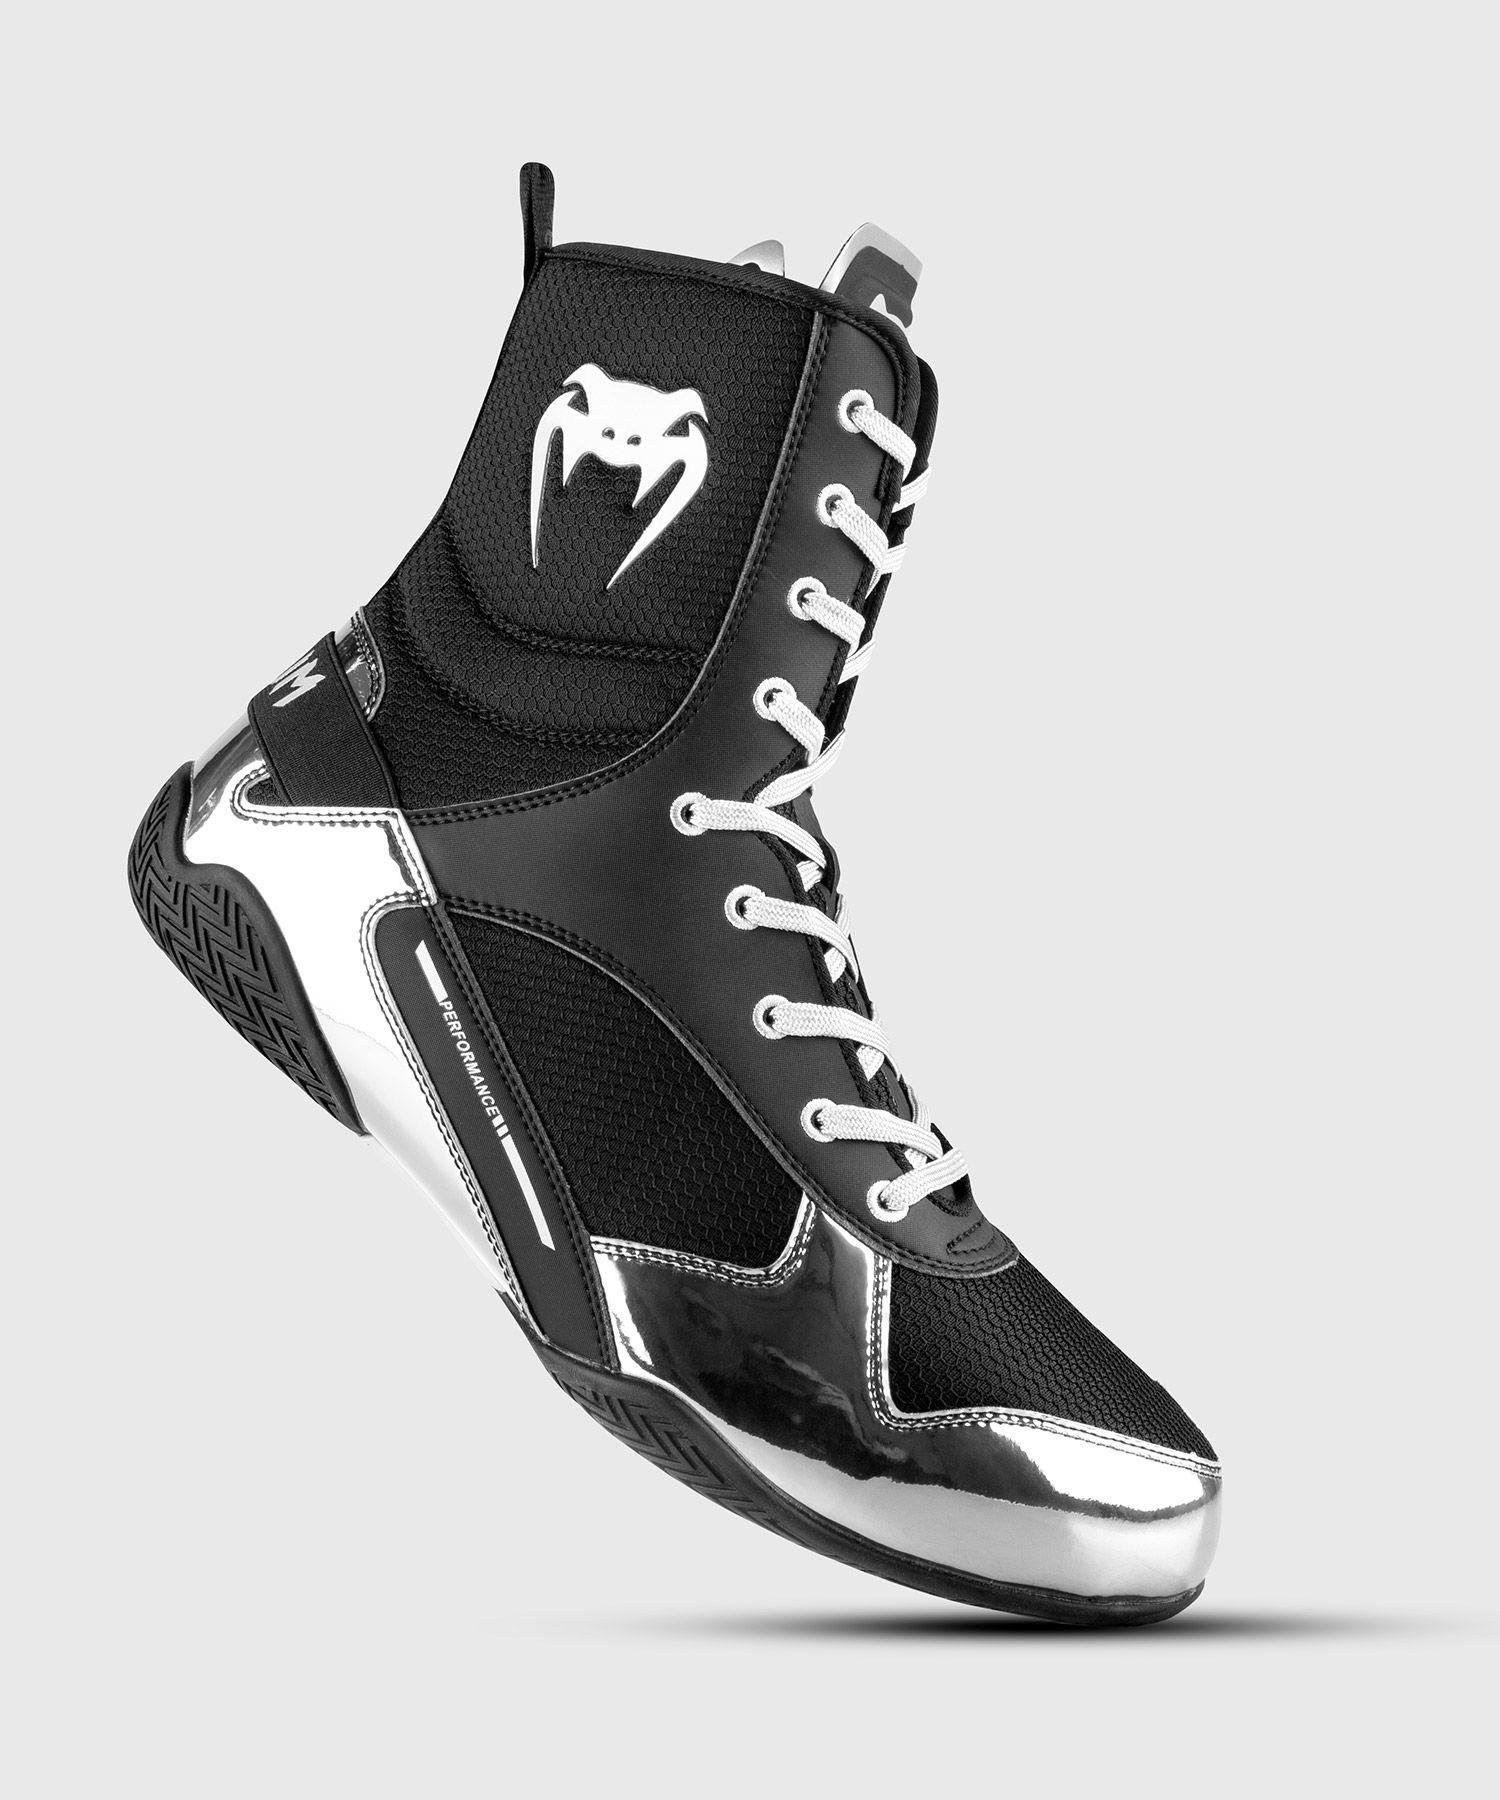 Botas de Boxeo Venum Elite - Negro/Plata